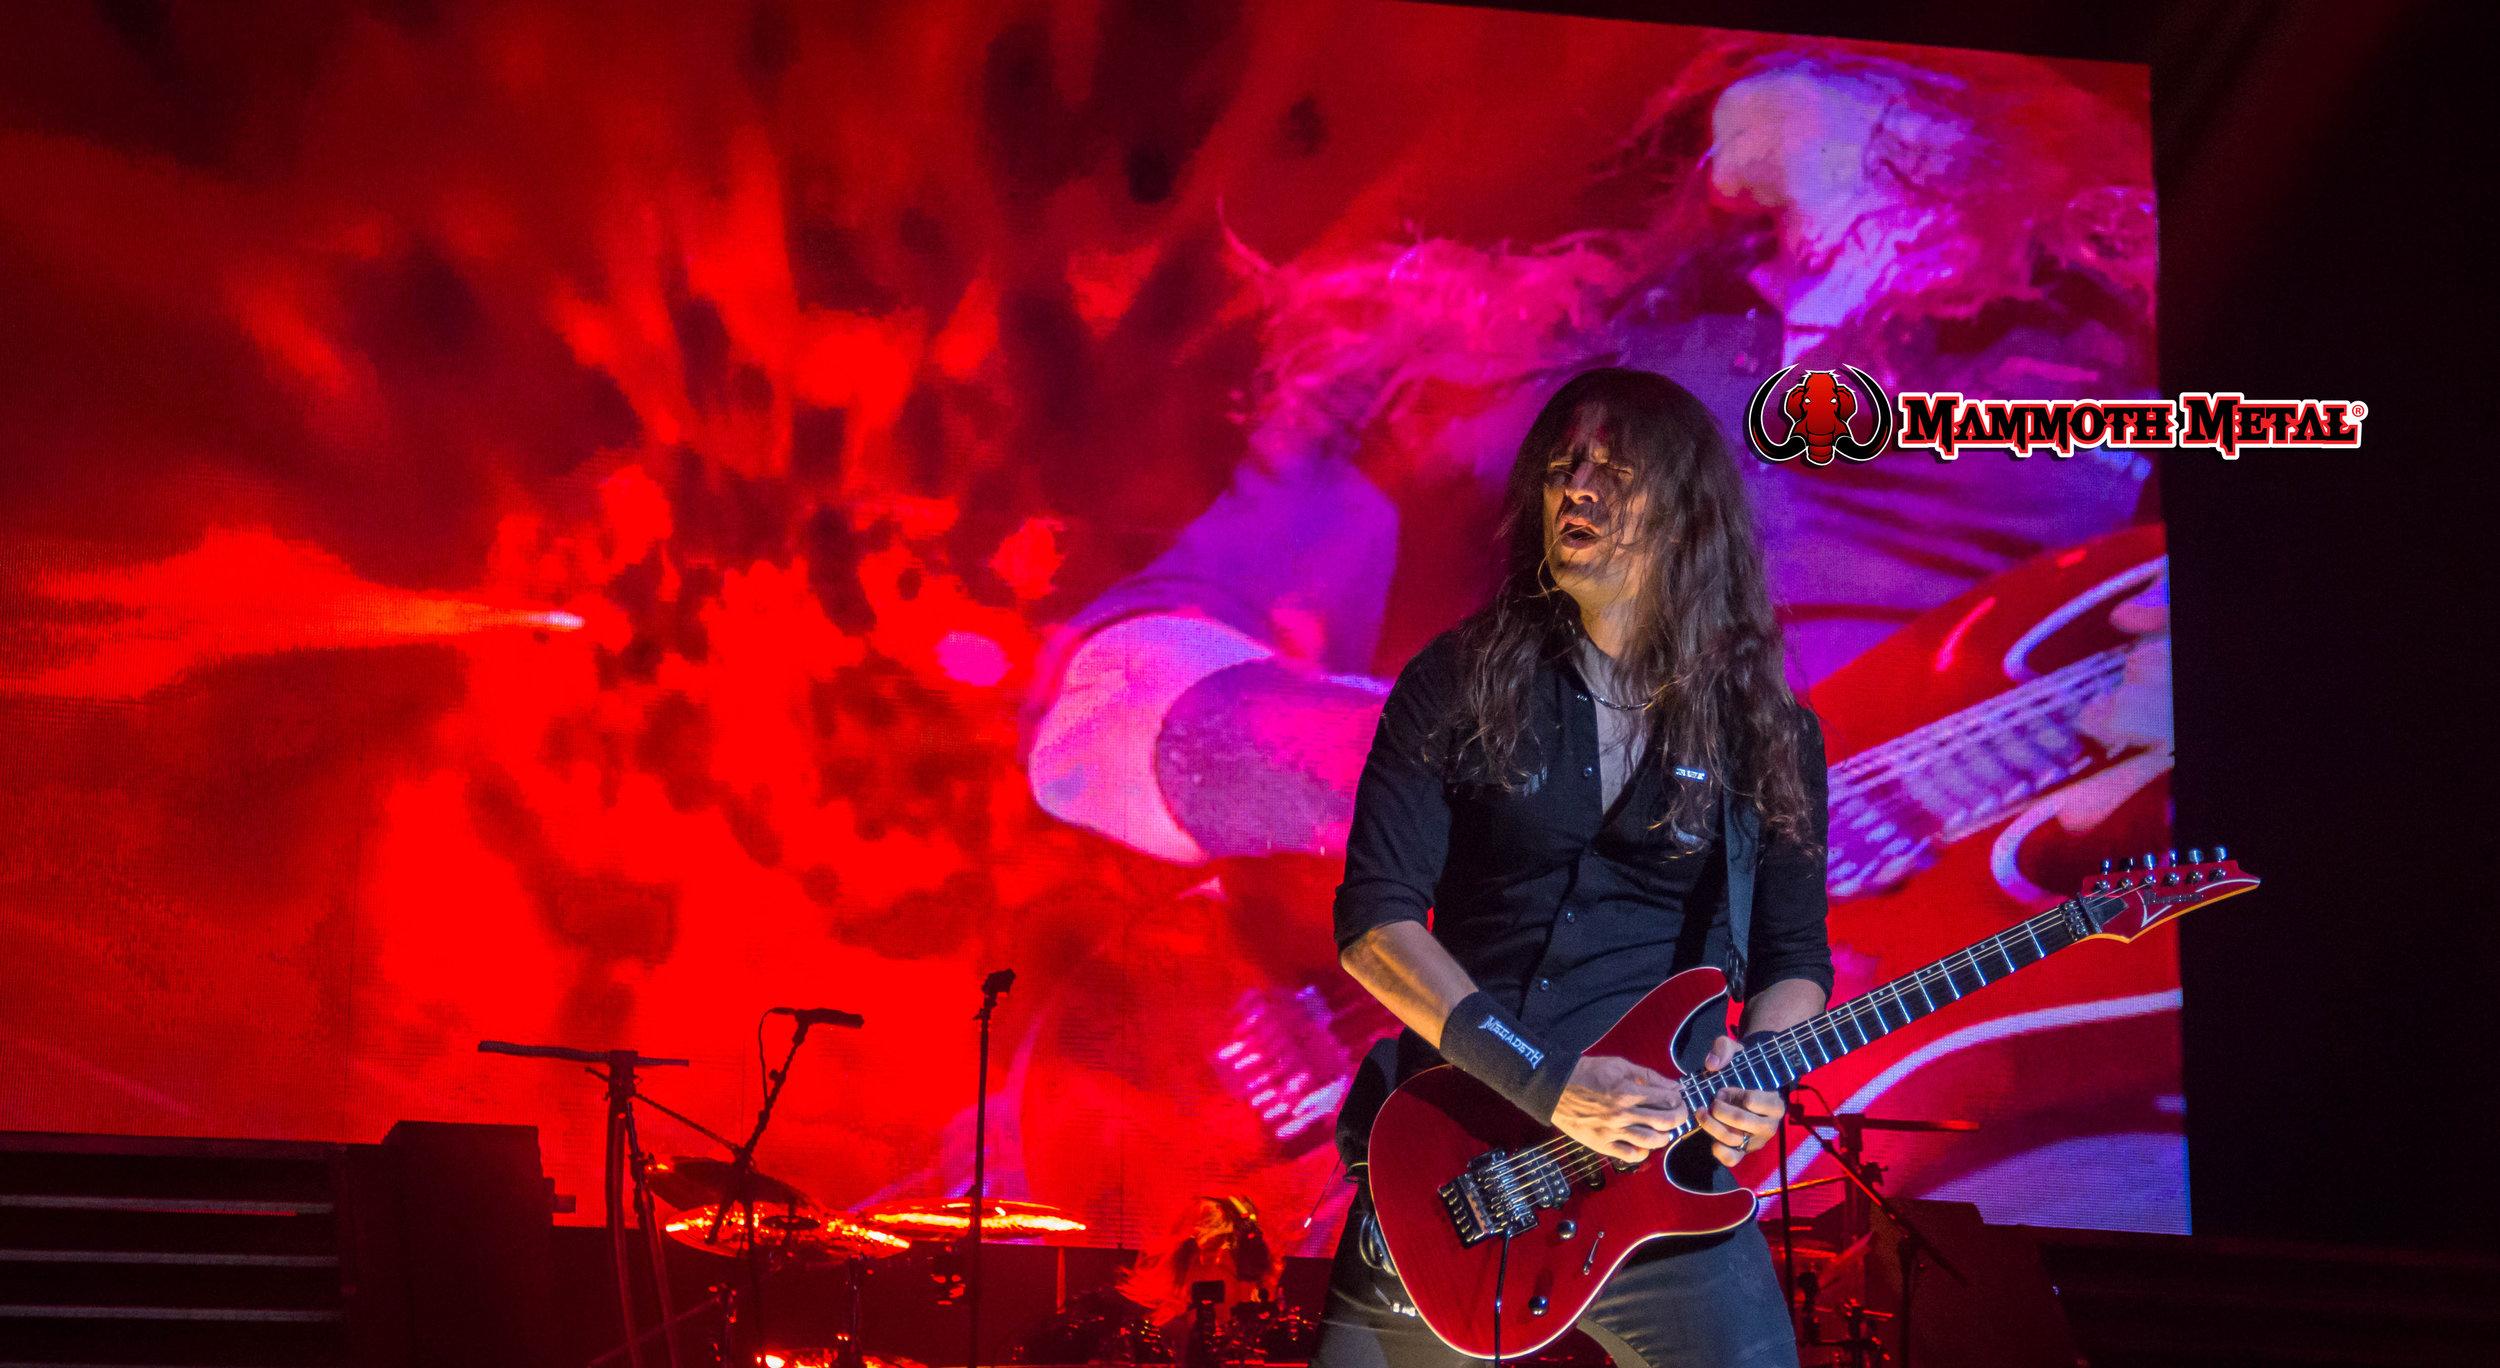 Megadeth's Kiko Loureiro is beyond word when watching him perform   photo: David Burke